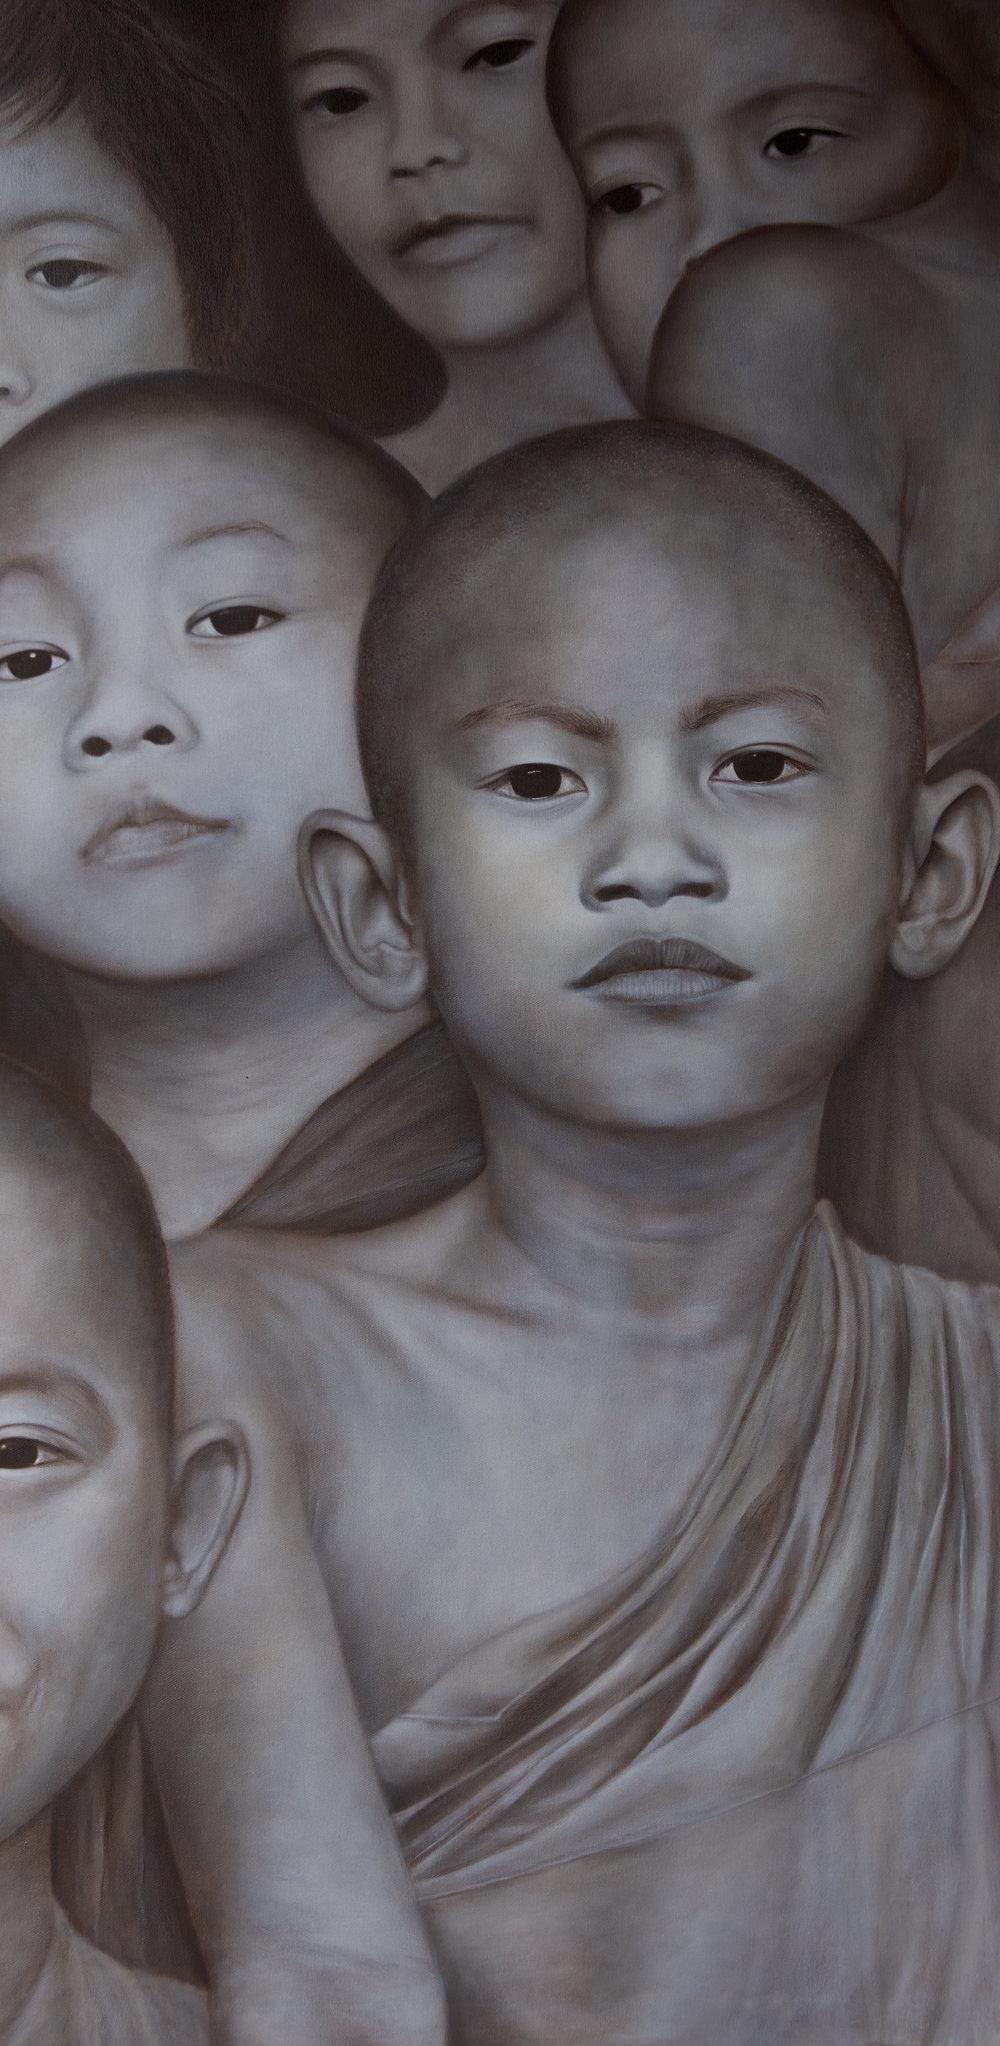 2017 Buddhistische Novizen, Myanmar.jpg